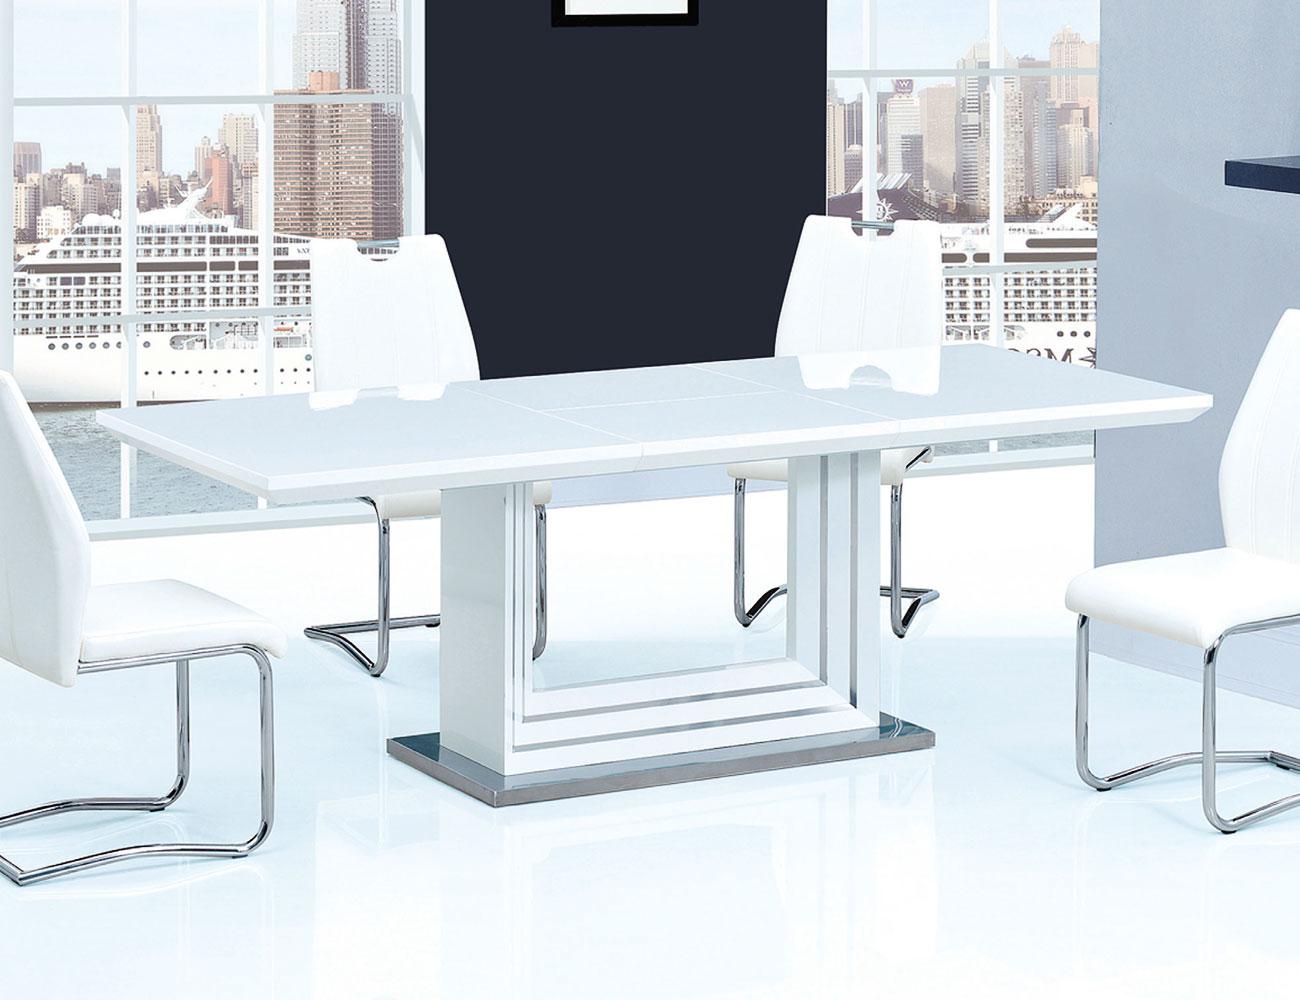 Mesa de comedor lacada en blanco alto brillo extensible de for Mesa comedor ovalada blanca